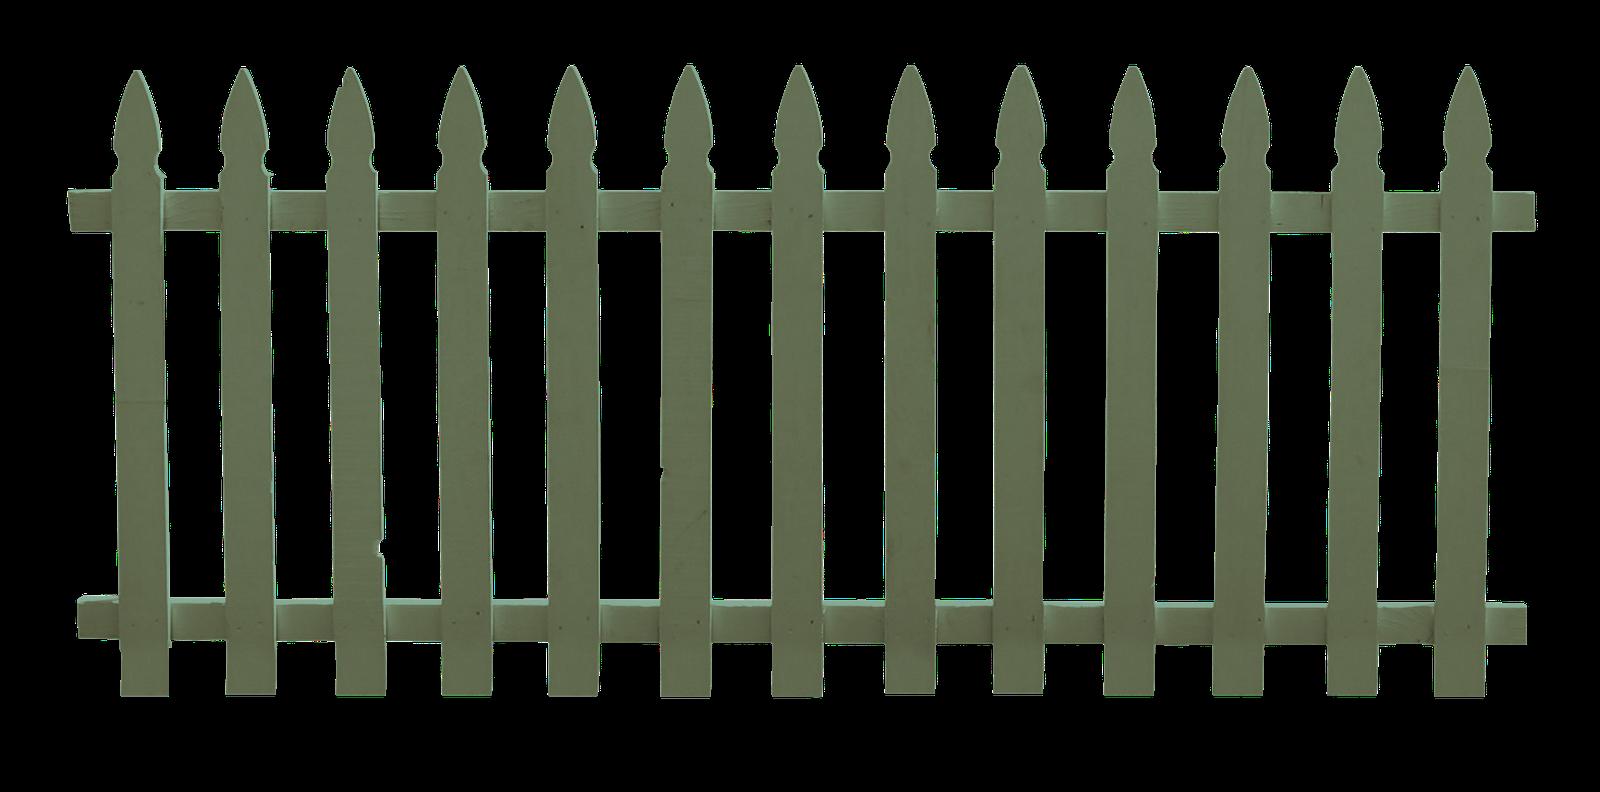 garden gate clipart - photo #39